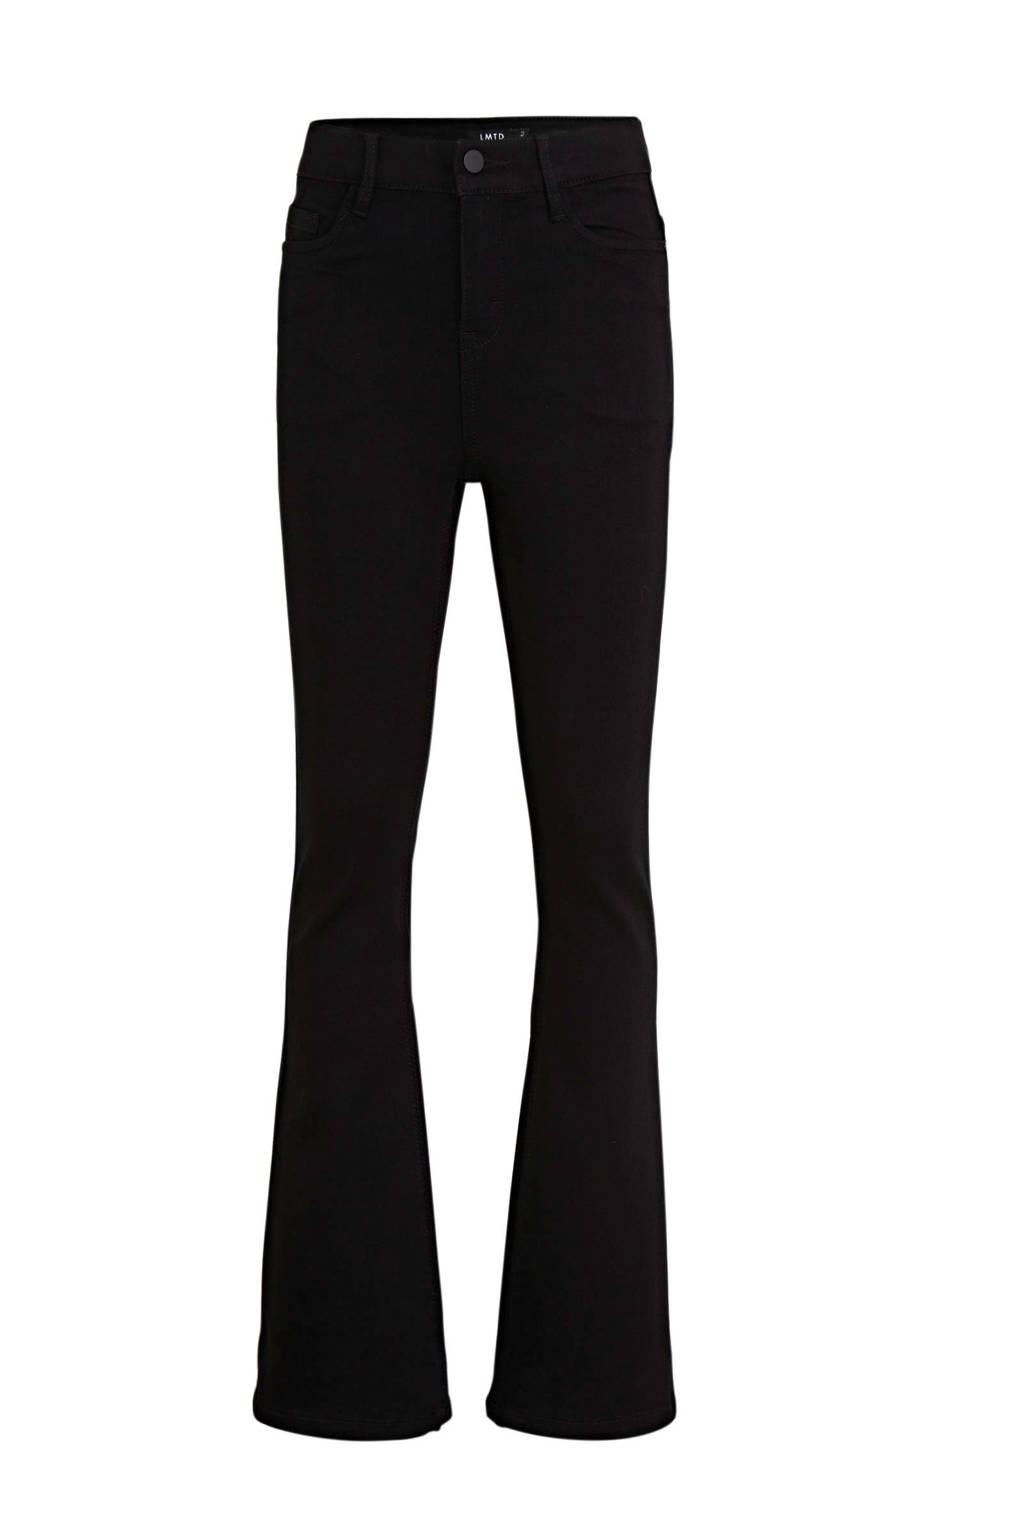 LMTD flared jeans Pil zwart, Zwart